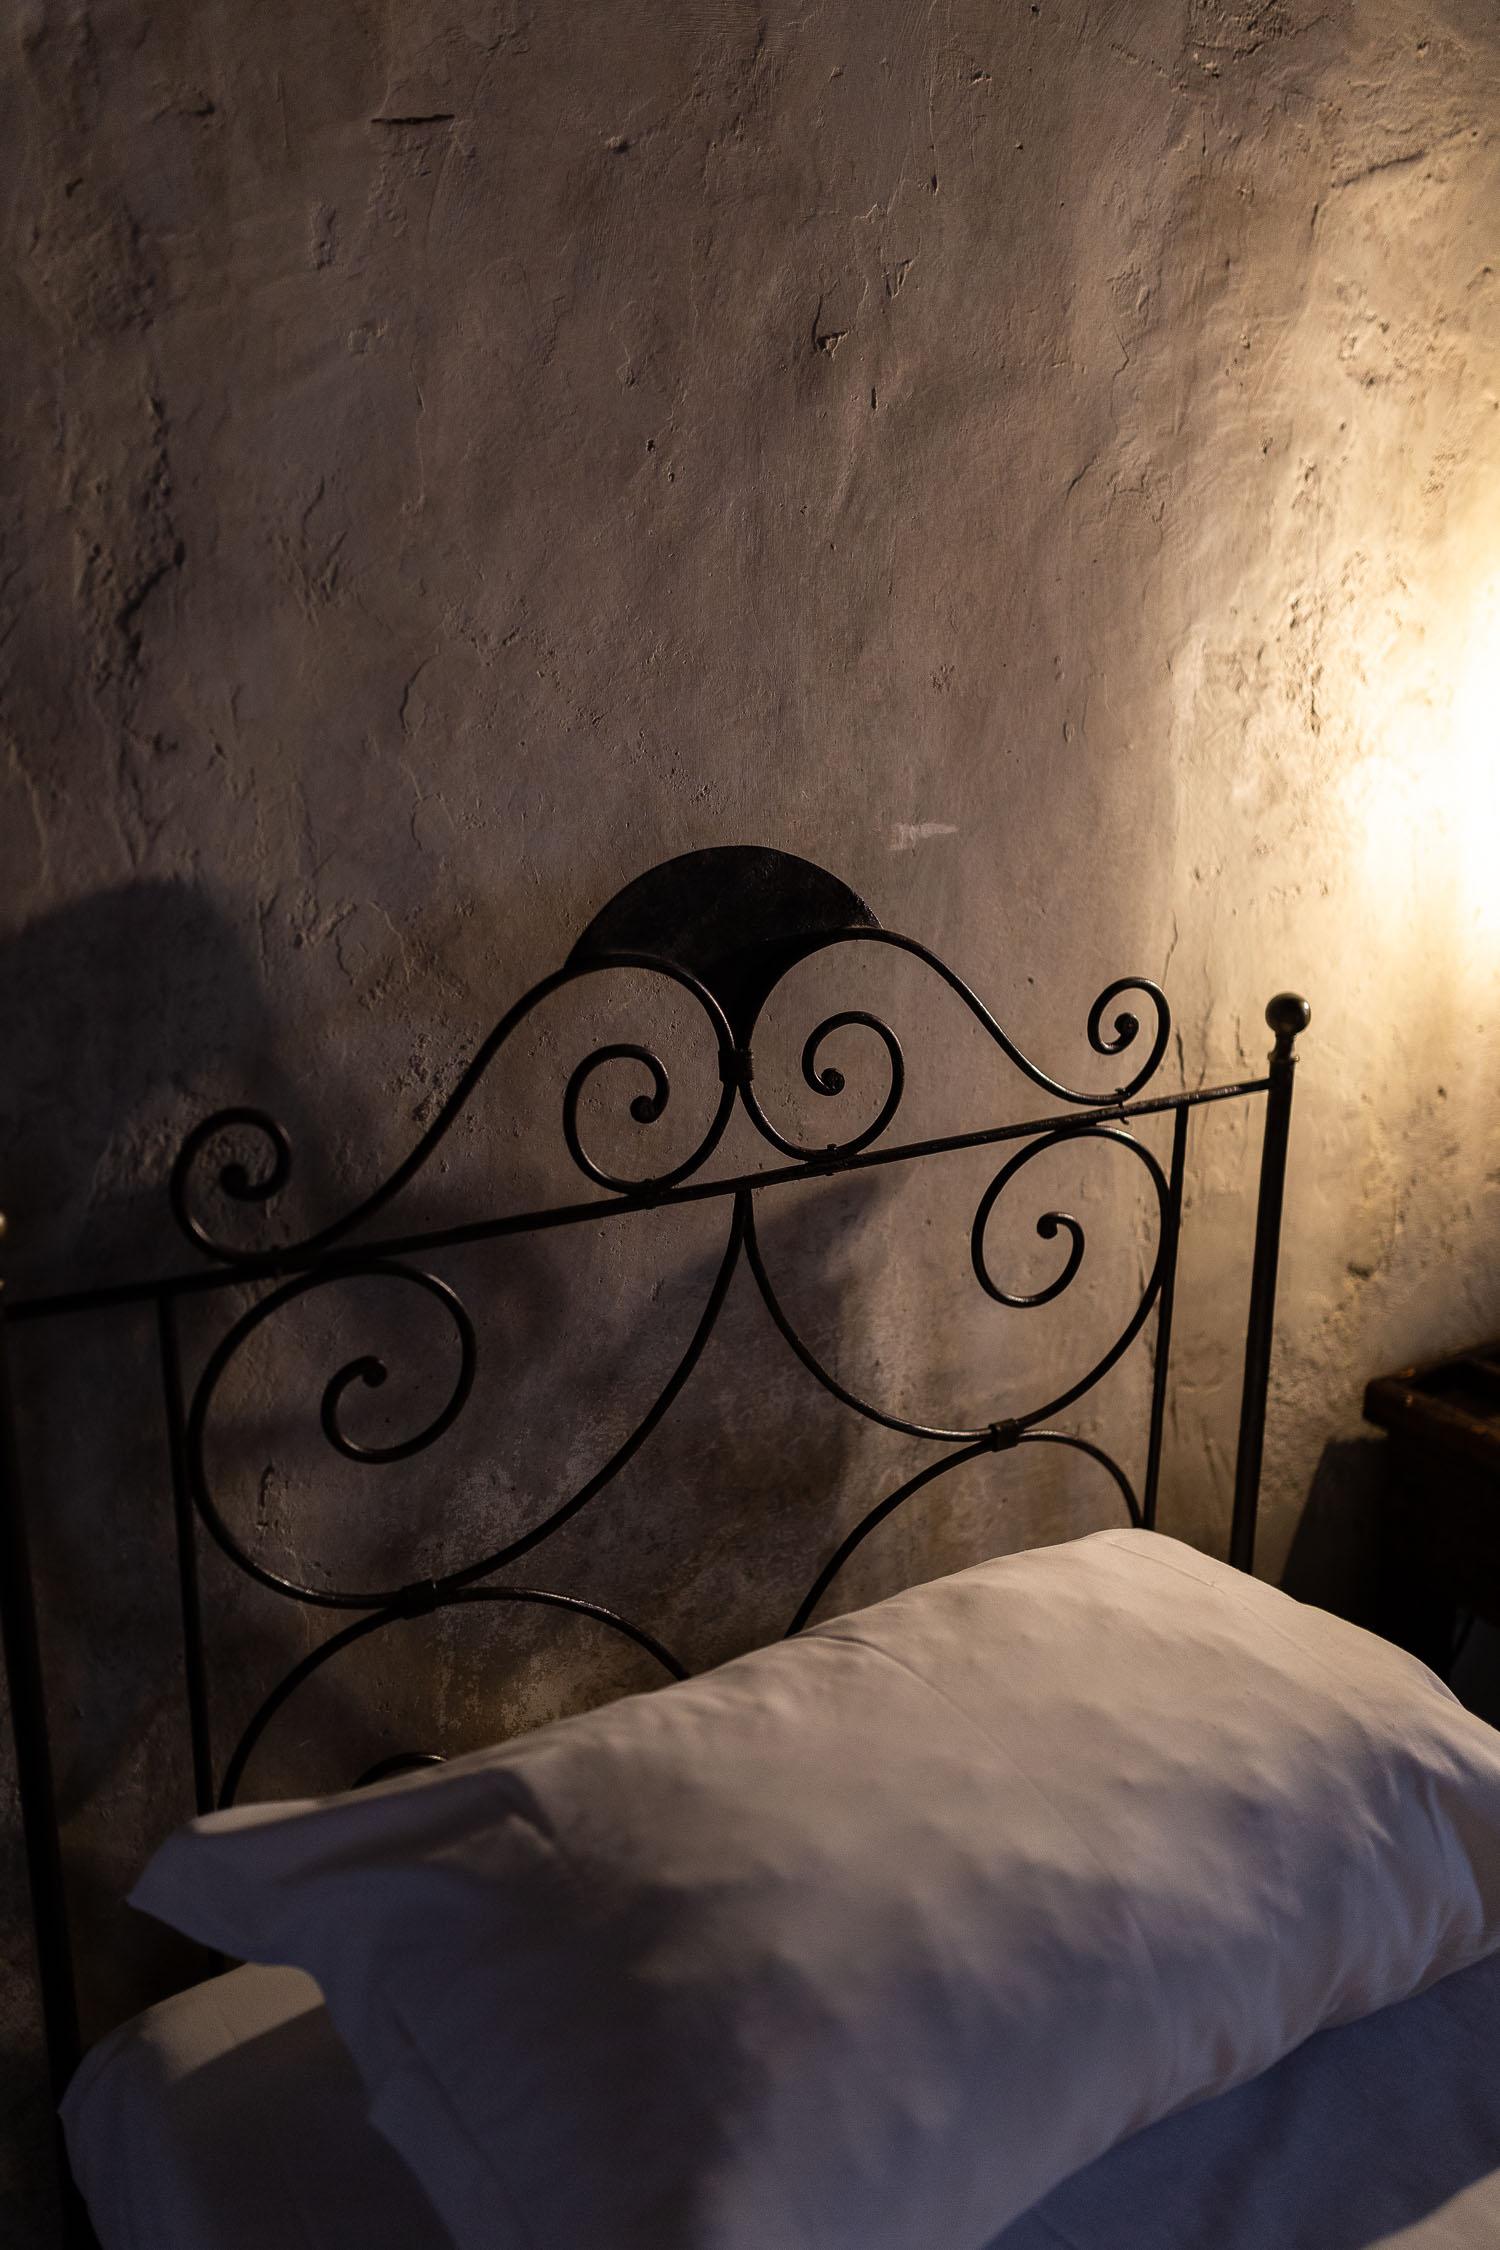 Sextantio-Albergo-Diffuso-iron-bed-detail-Abruzzo-5560.jpg